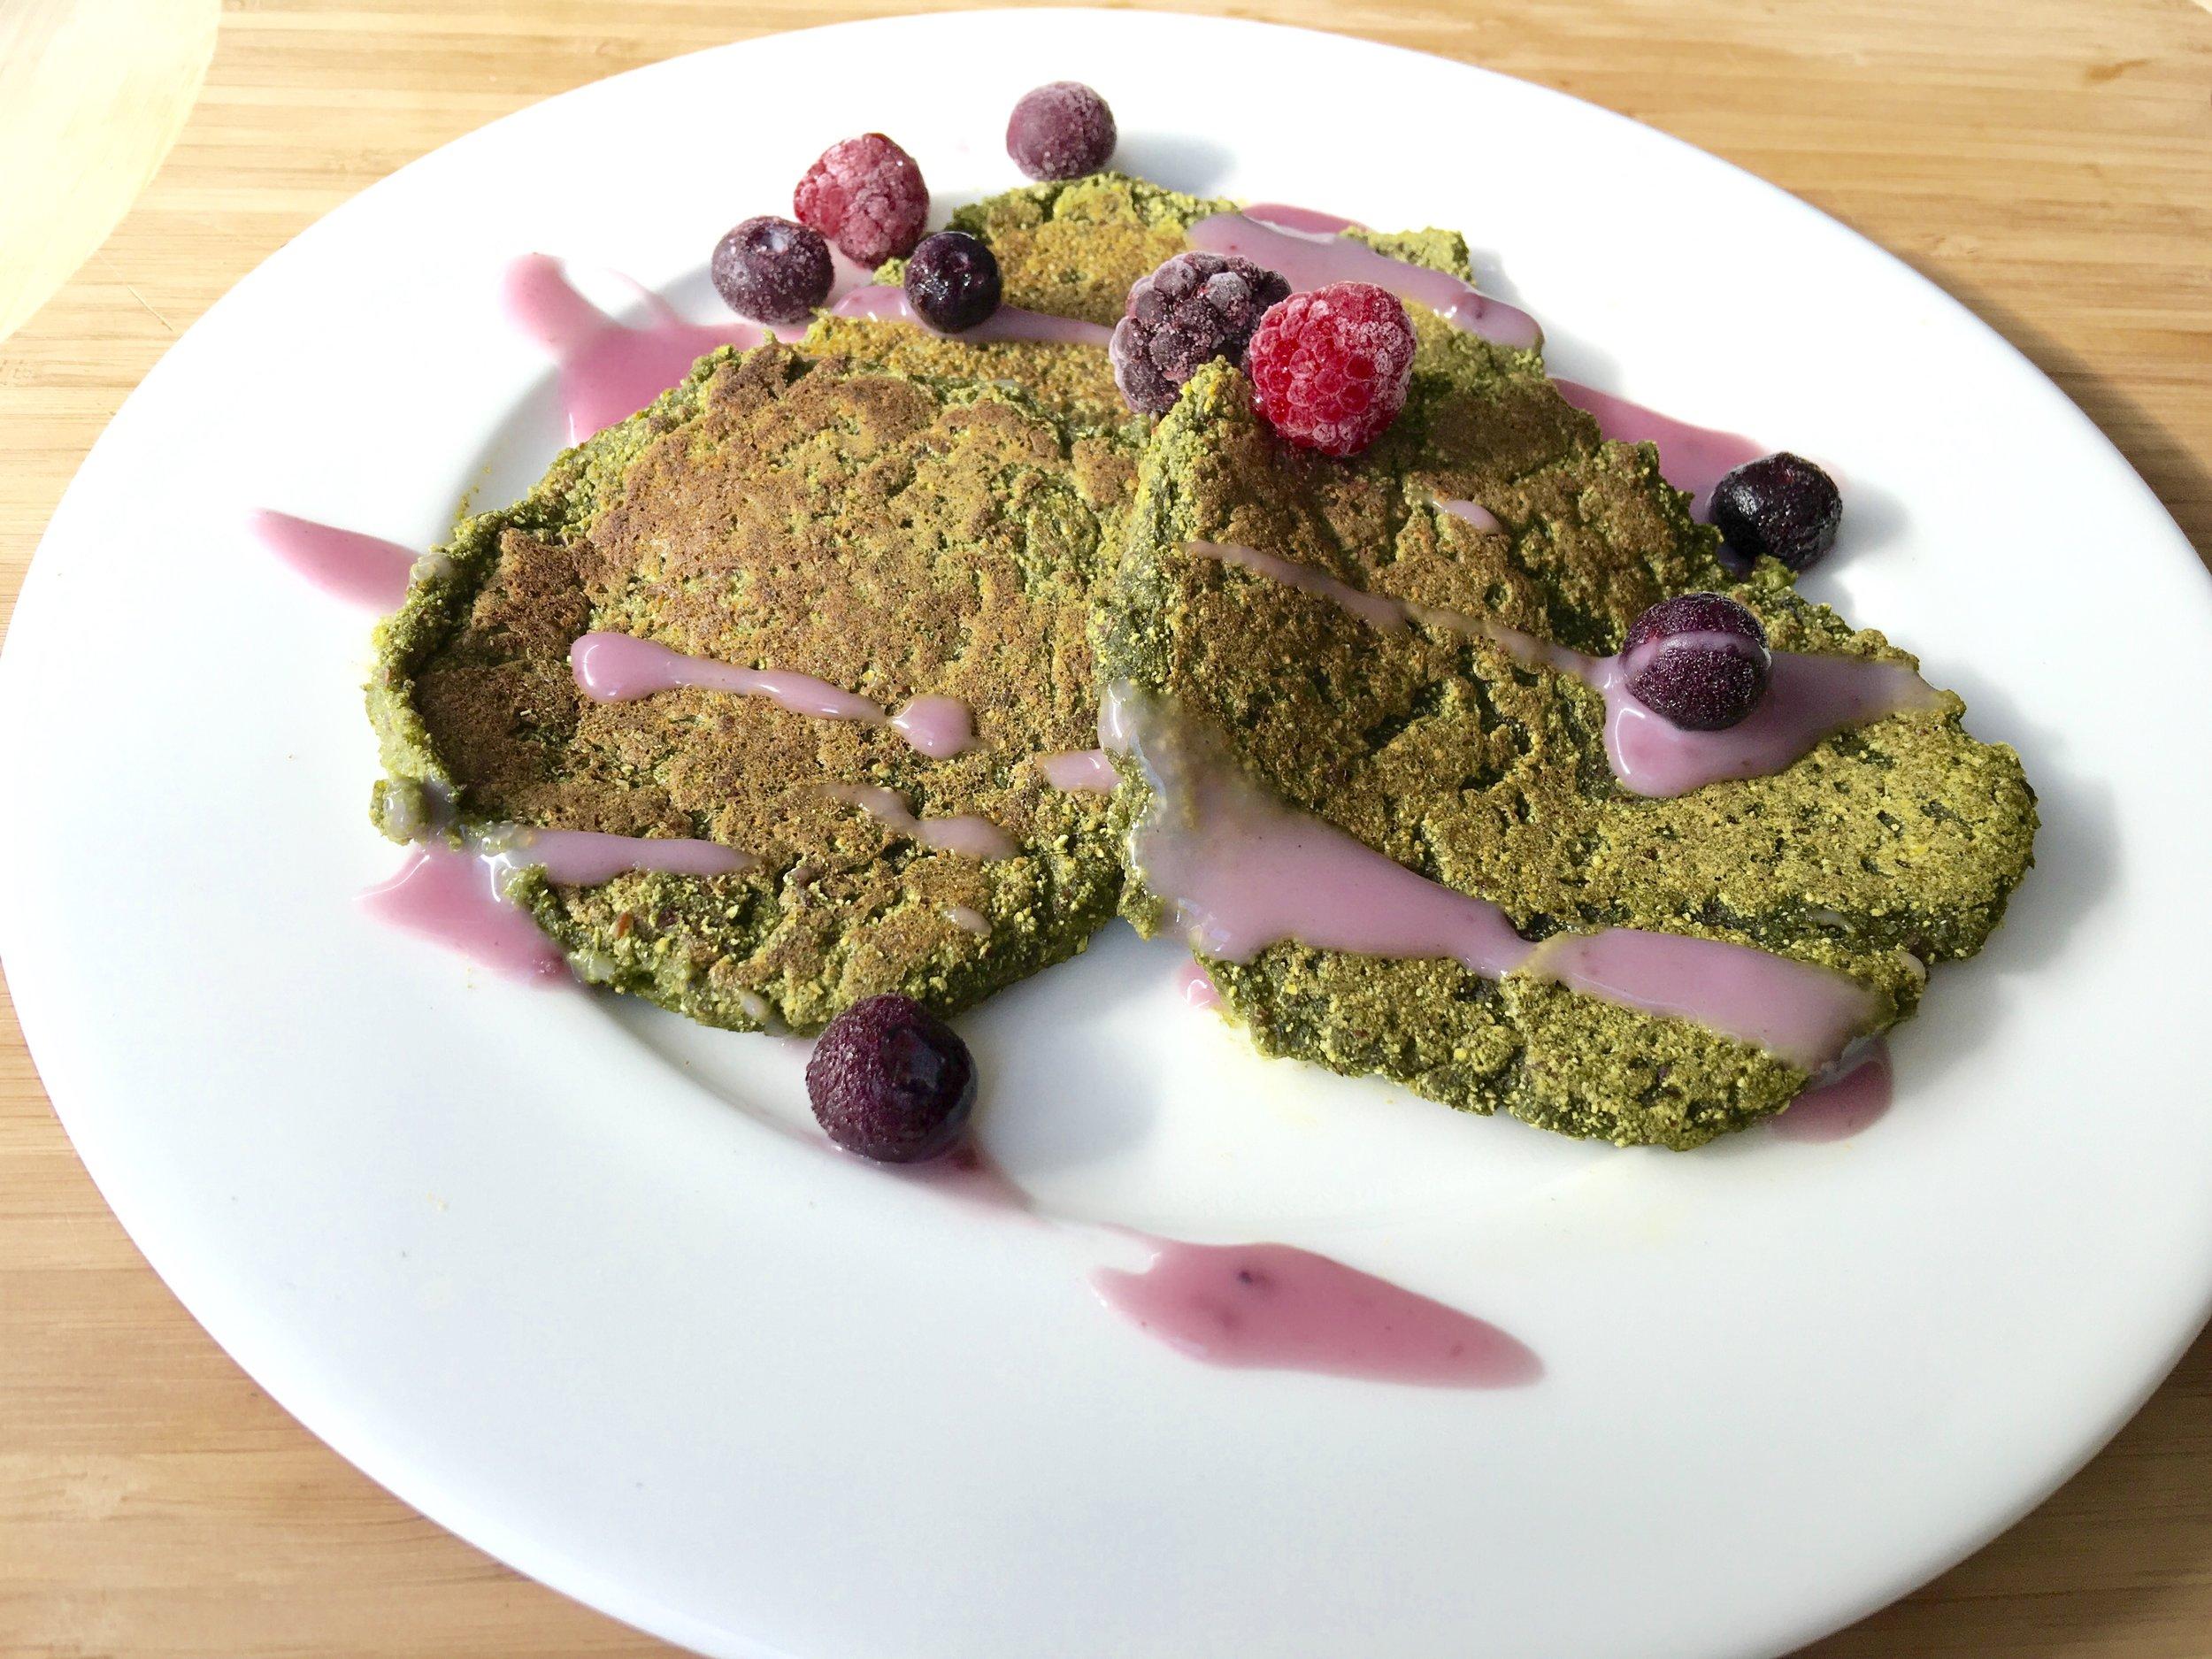 Amazing Pancakes- gluten free, vegan, flourless, fast superfood